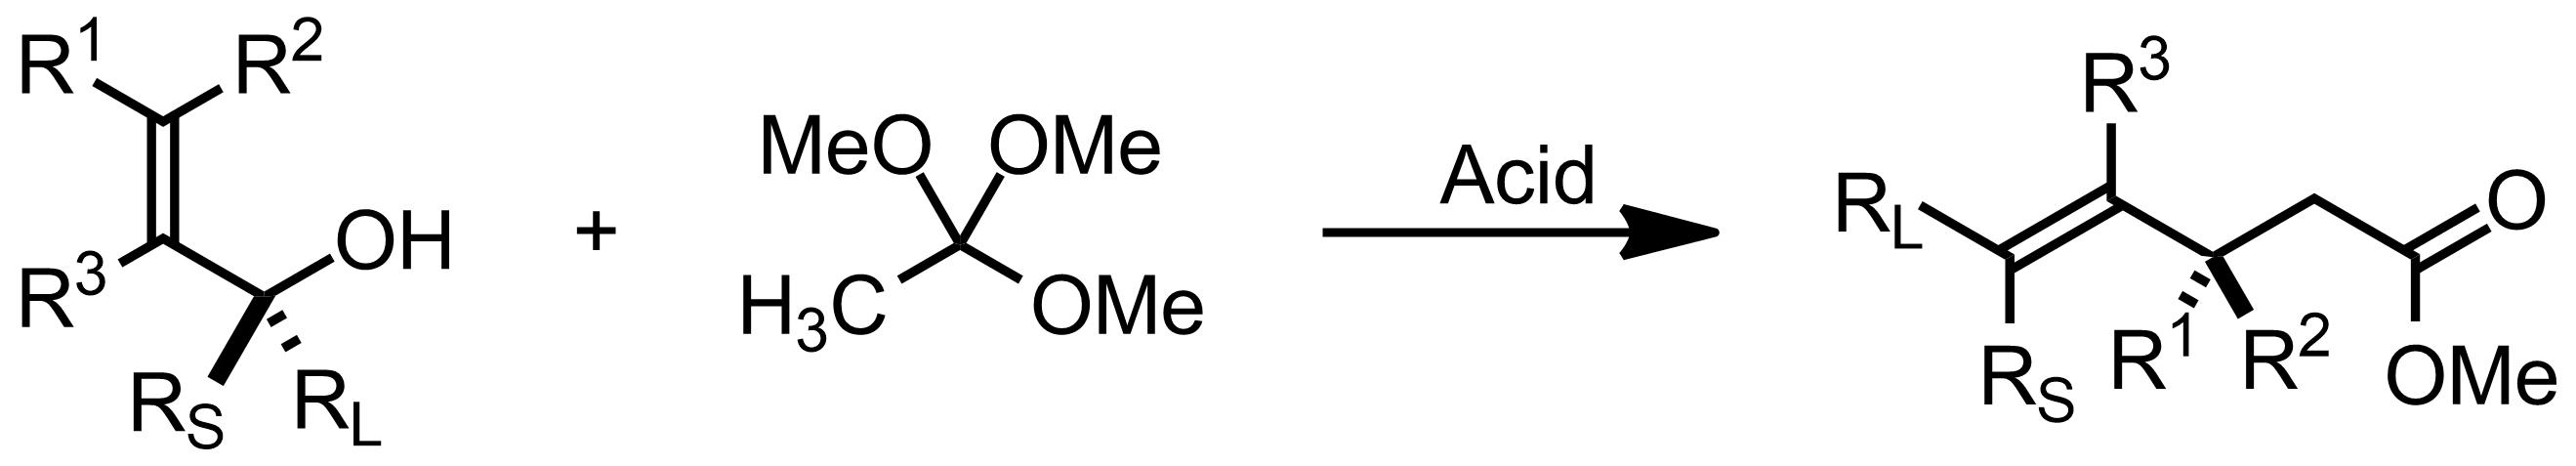 Schematic representation of the Johnson-Claisen Rearrangement.